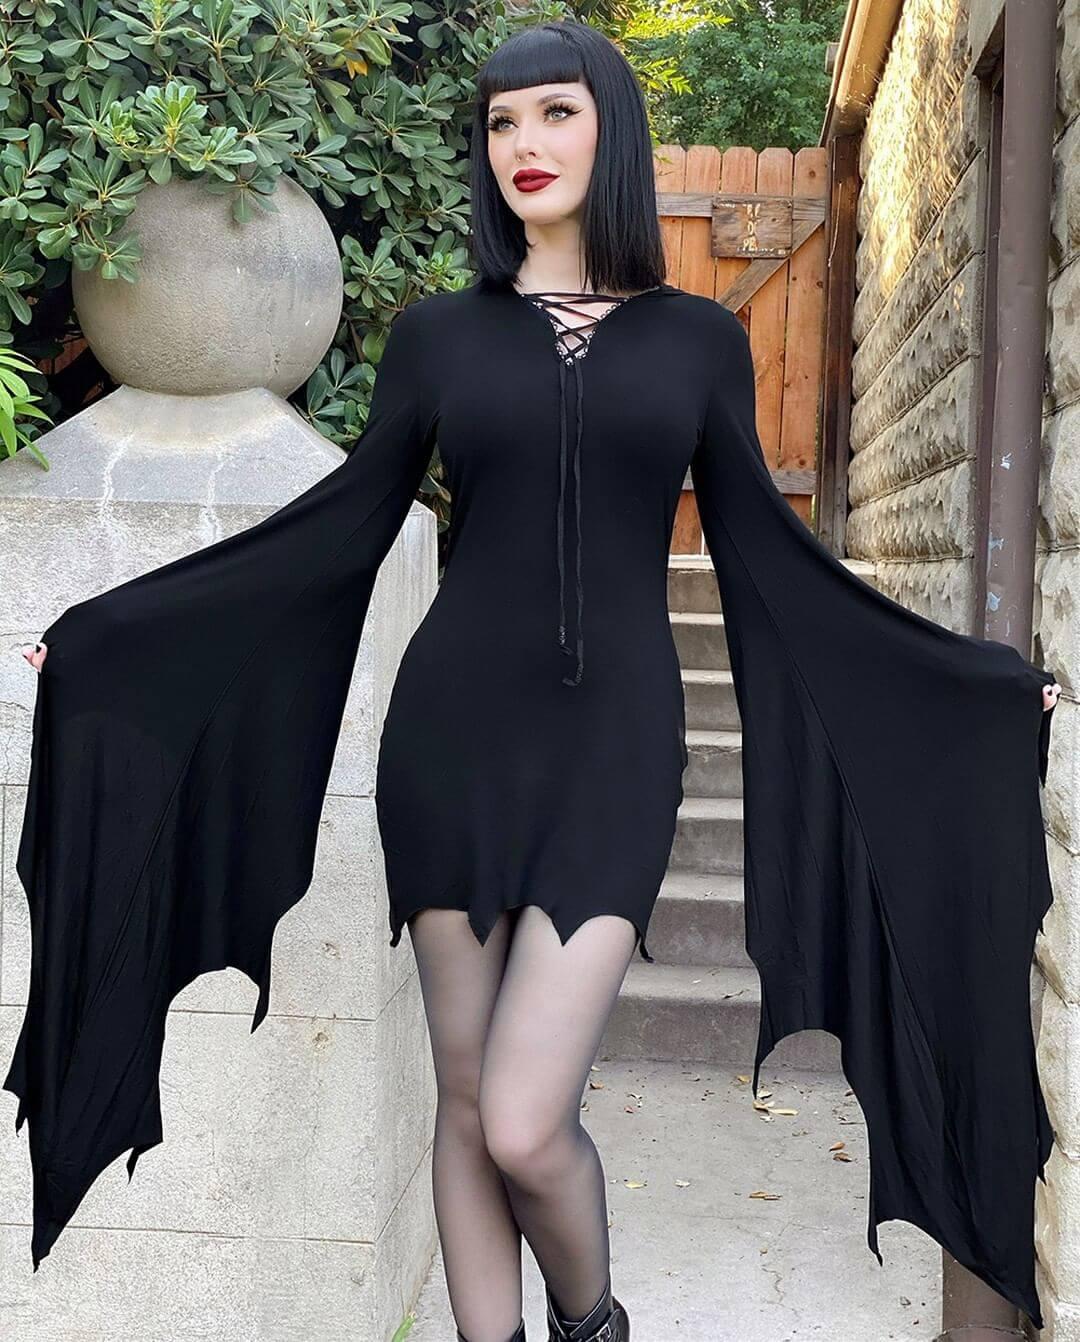 Halloween Costumes for Women Gothic And Vampire Inspired Halloween Costume